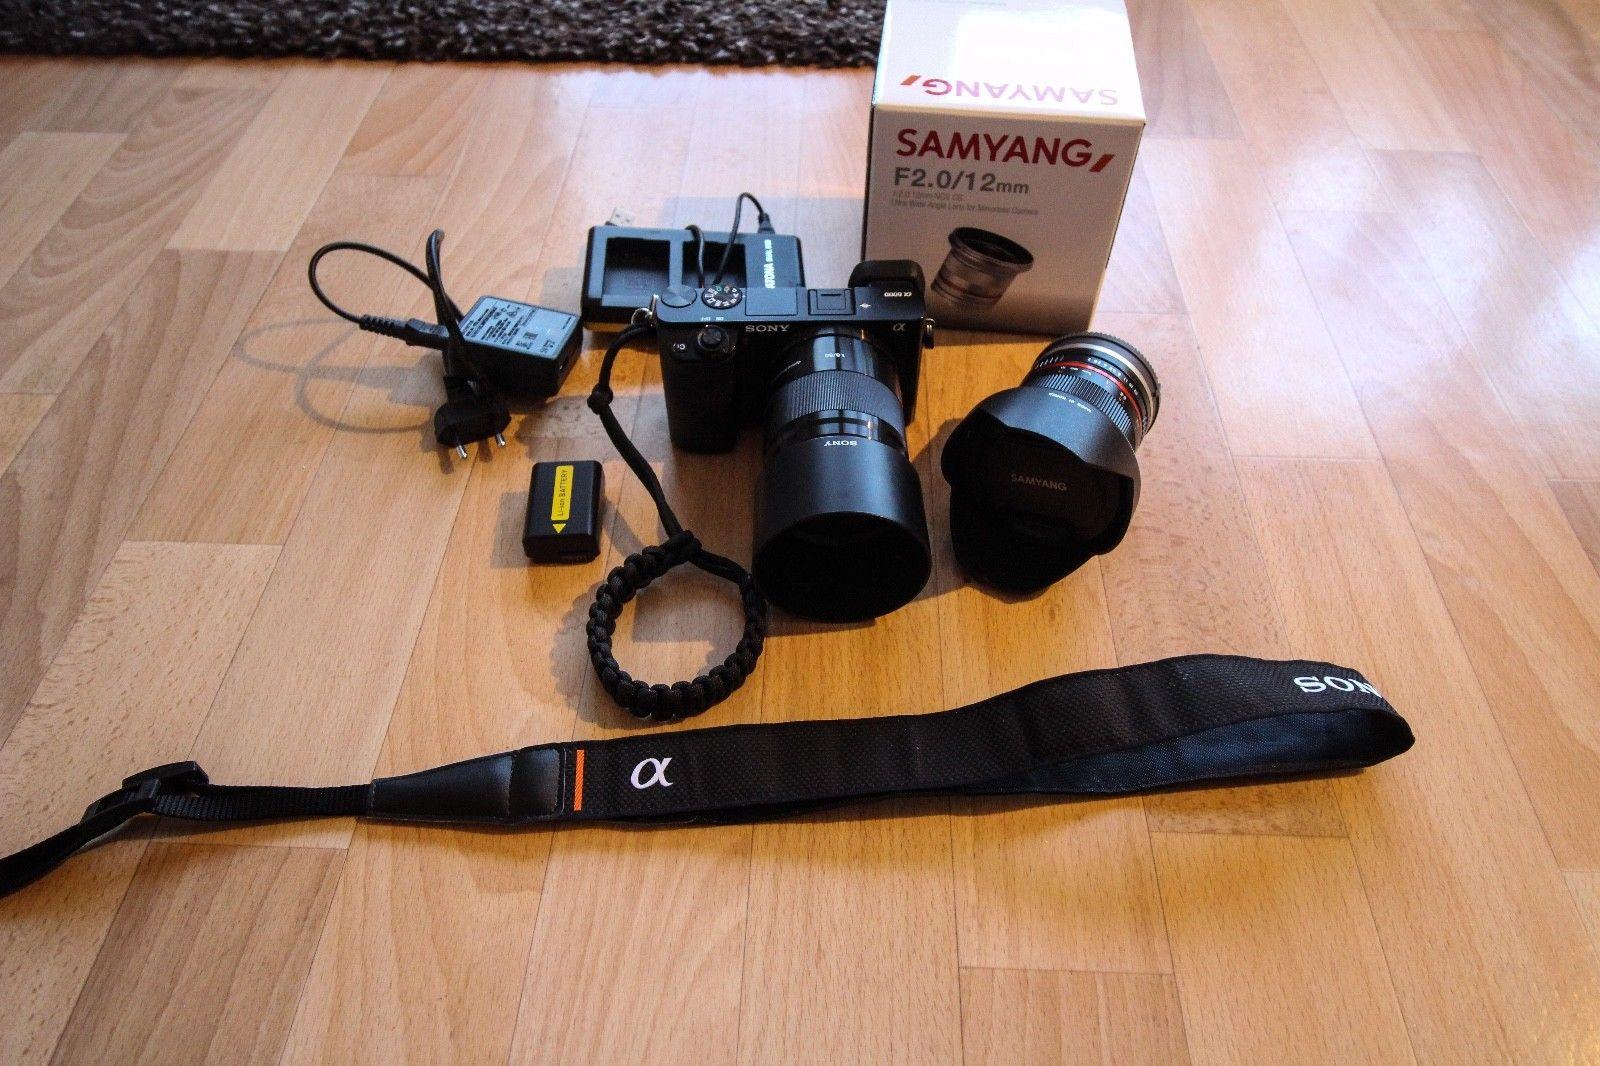 Sony Alpha 6000 - Schwarz mit Sony SEL50F18 & Samyang 12mm F2.0 + Zubehörpaket